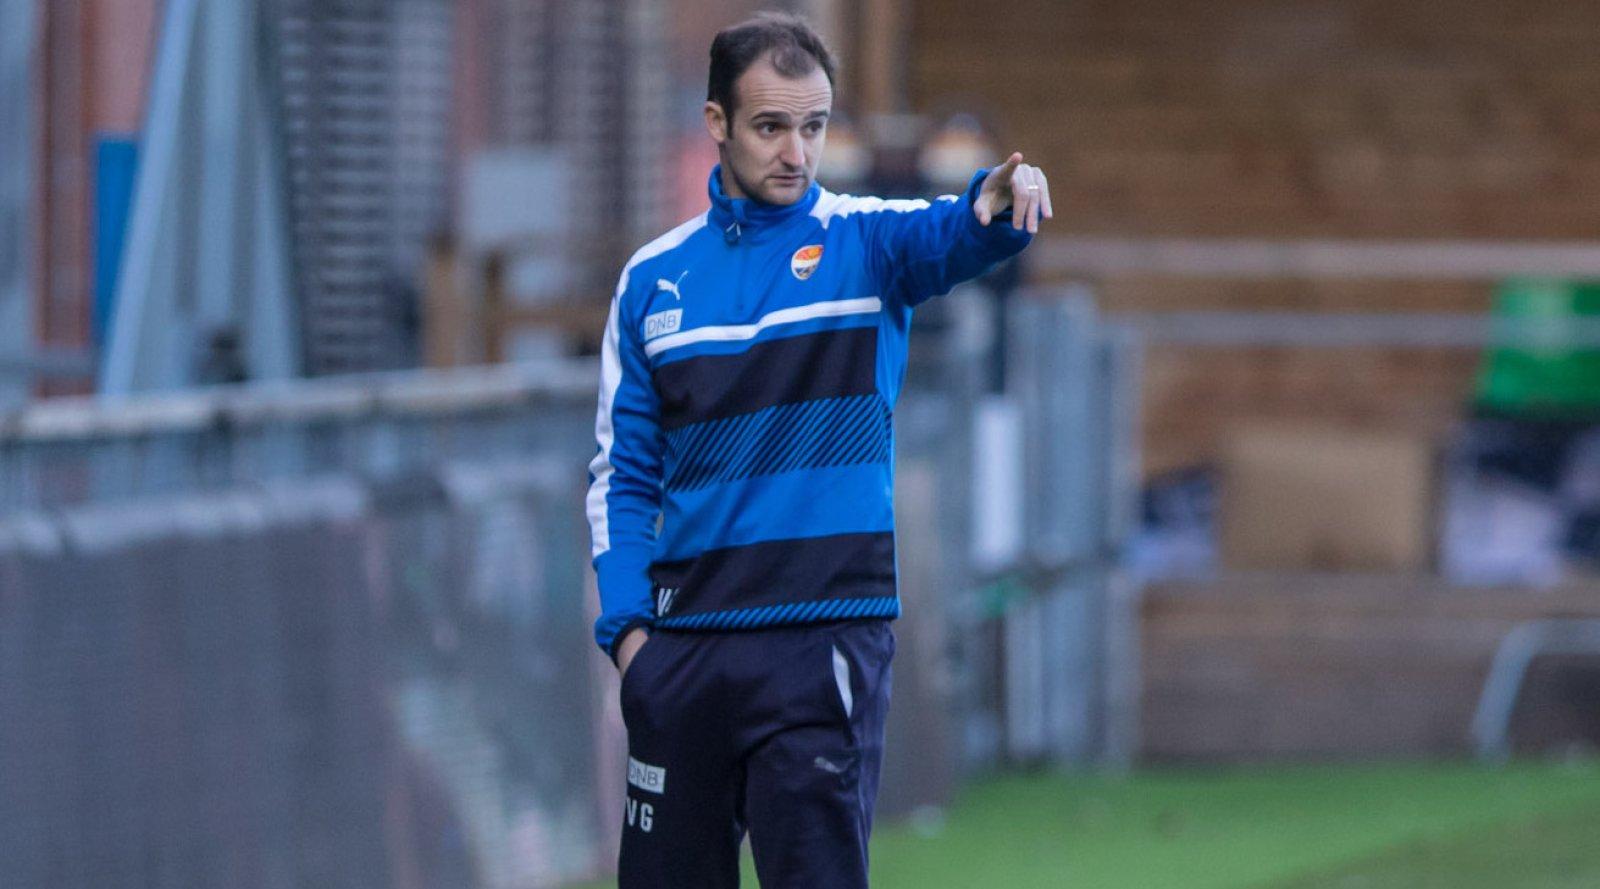 Team SIF - Moss FK 2-5, 18. april 2017: Hovedtrener Vitor Gazimba.